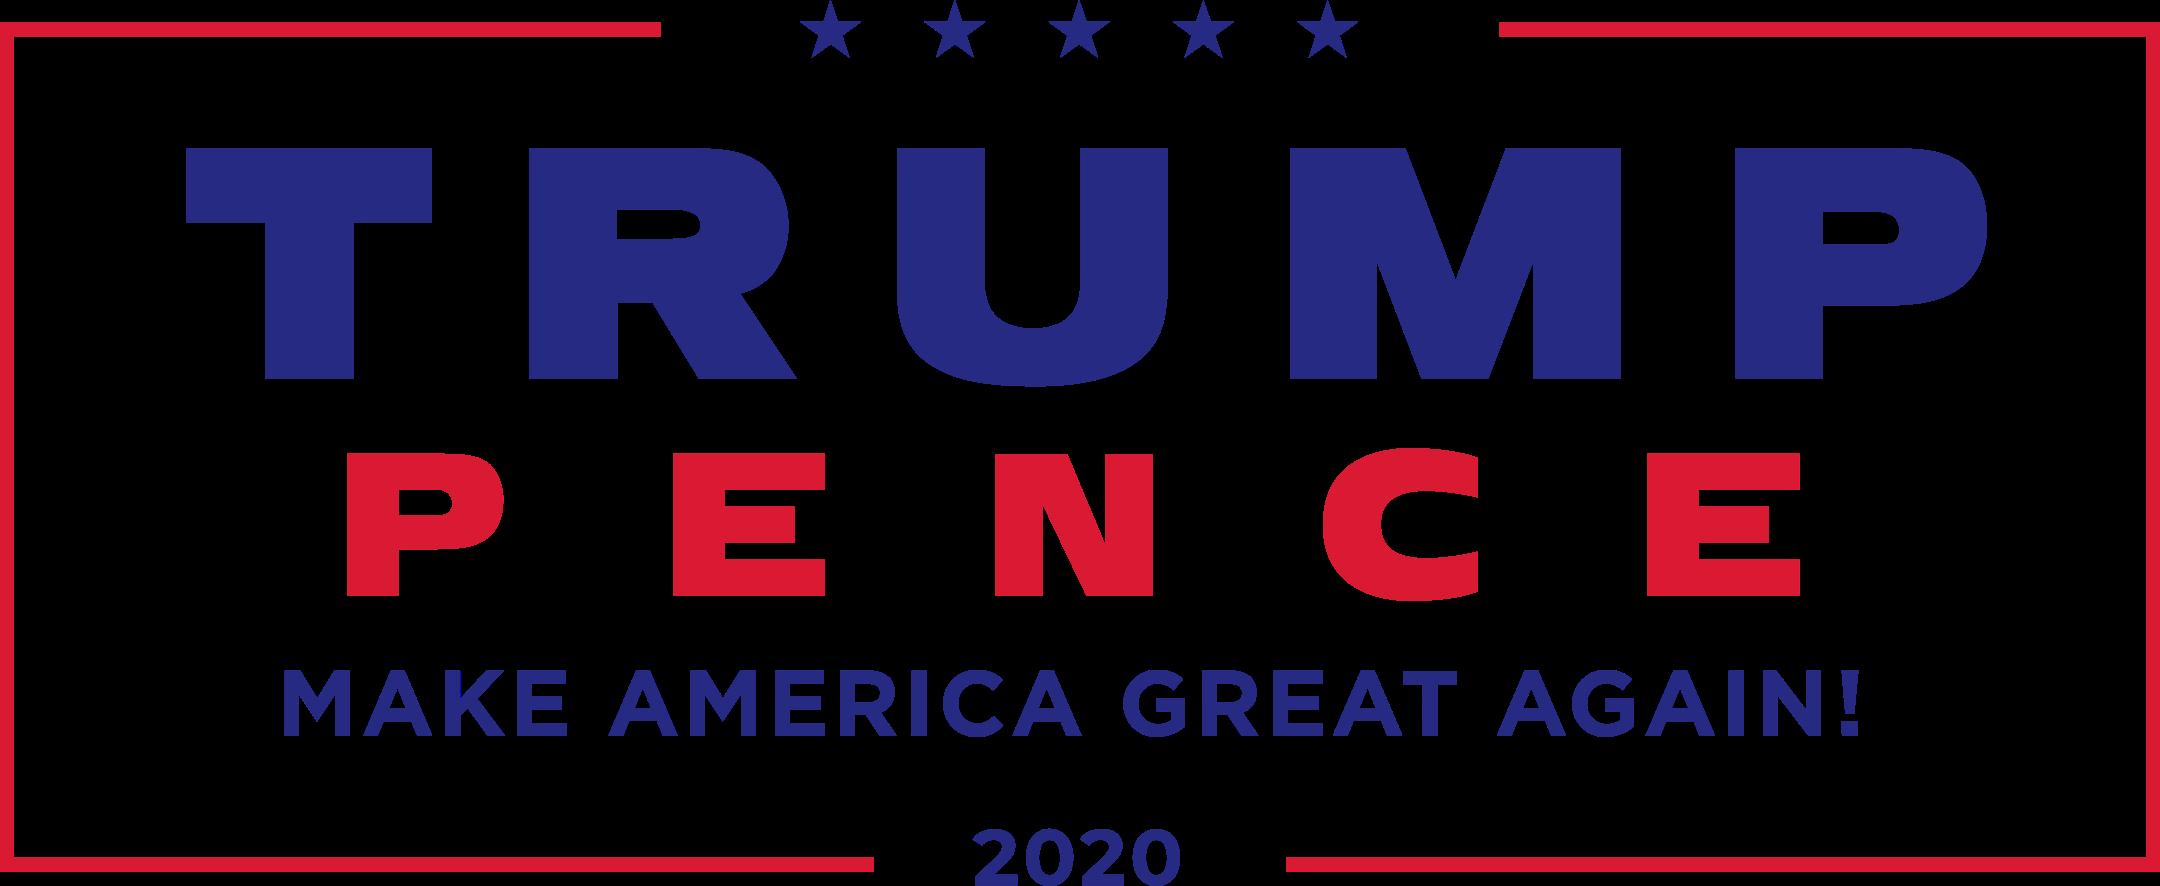 trump president 2020 logo 1 - Trump President 2020 Logo